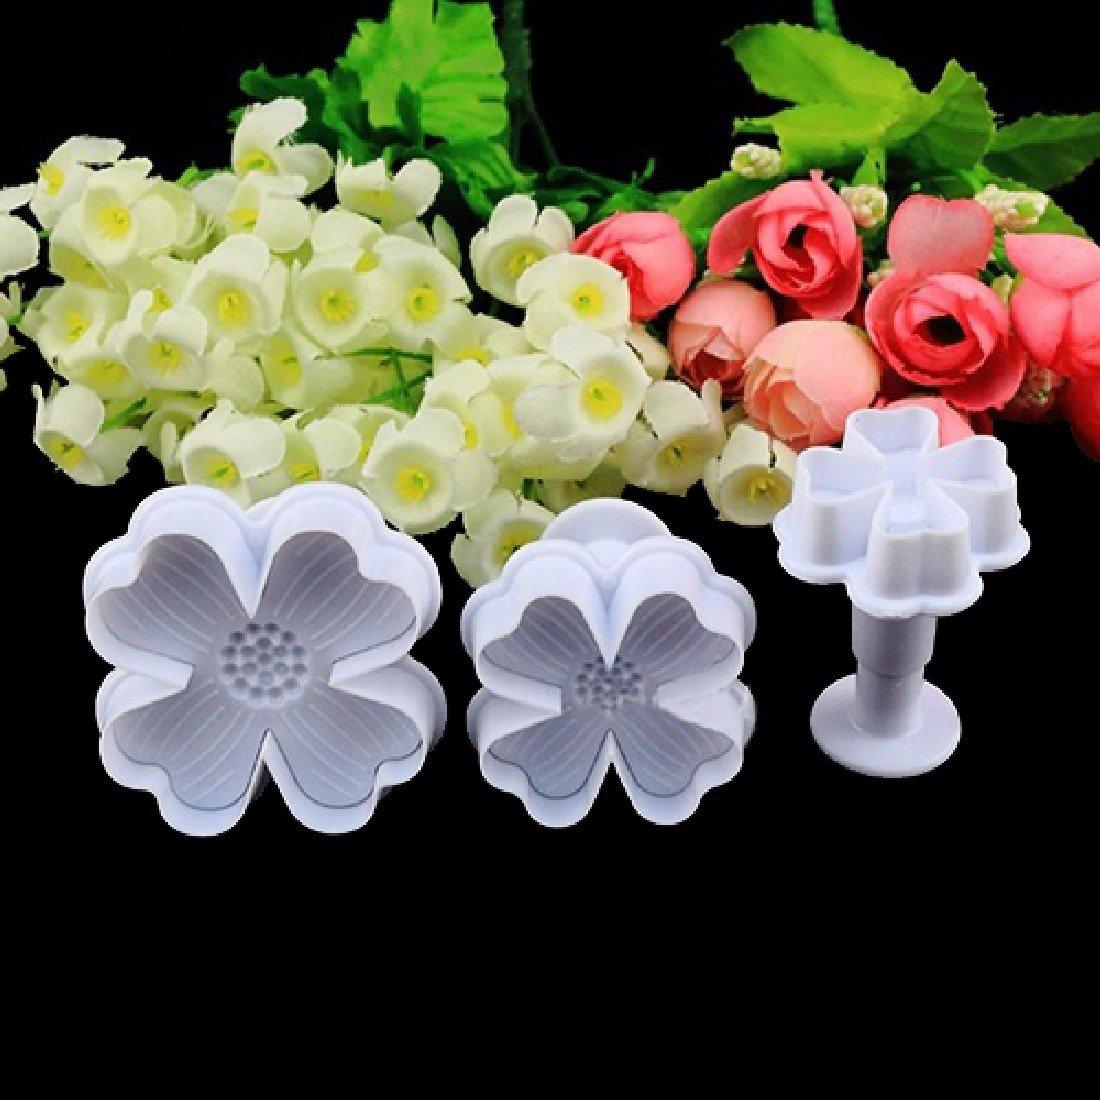 New 3pcs/set Flower Shape Cake Sugarcraft Plunger Decoration Diy Tool Mold Kitchen Accessories by Joylive (Image #4)